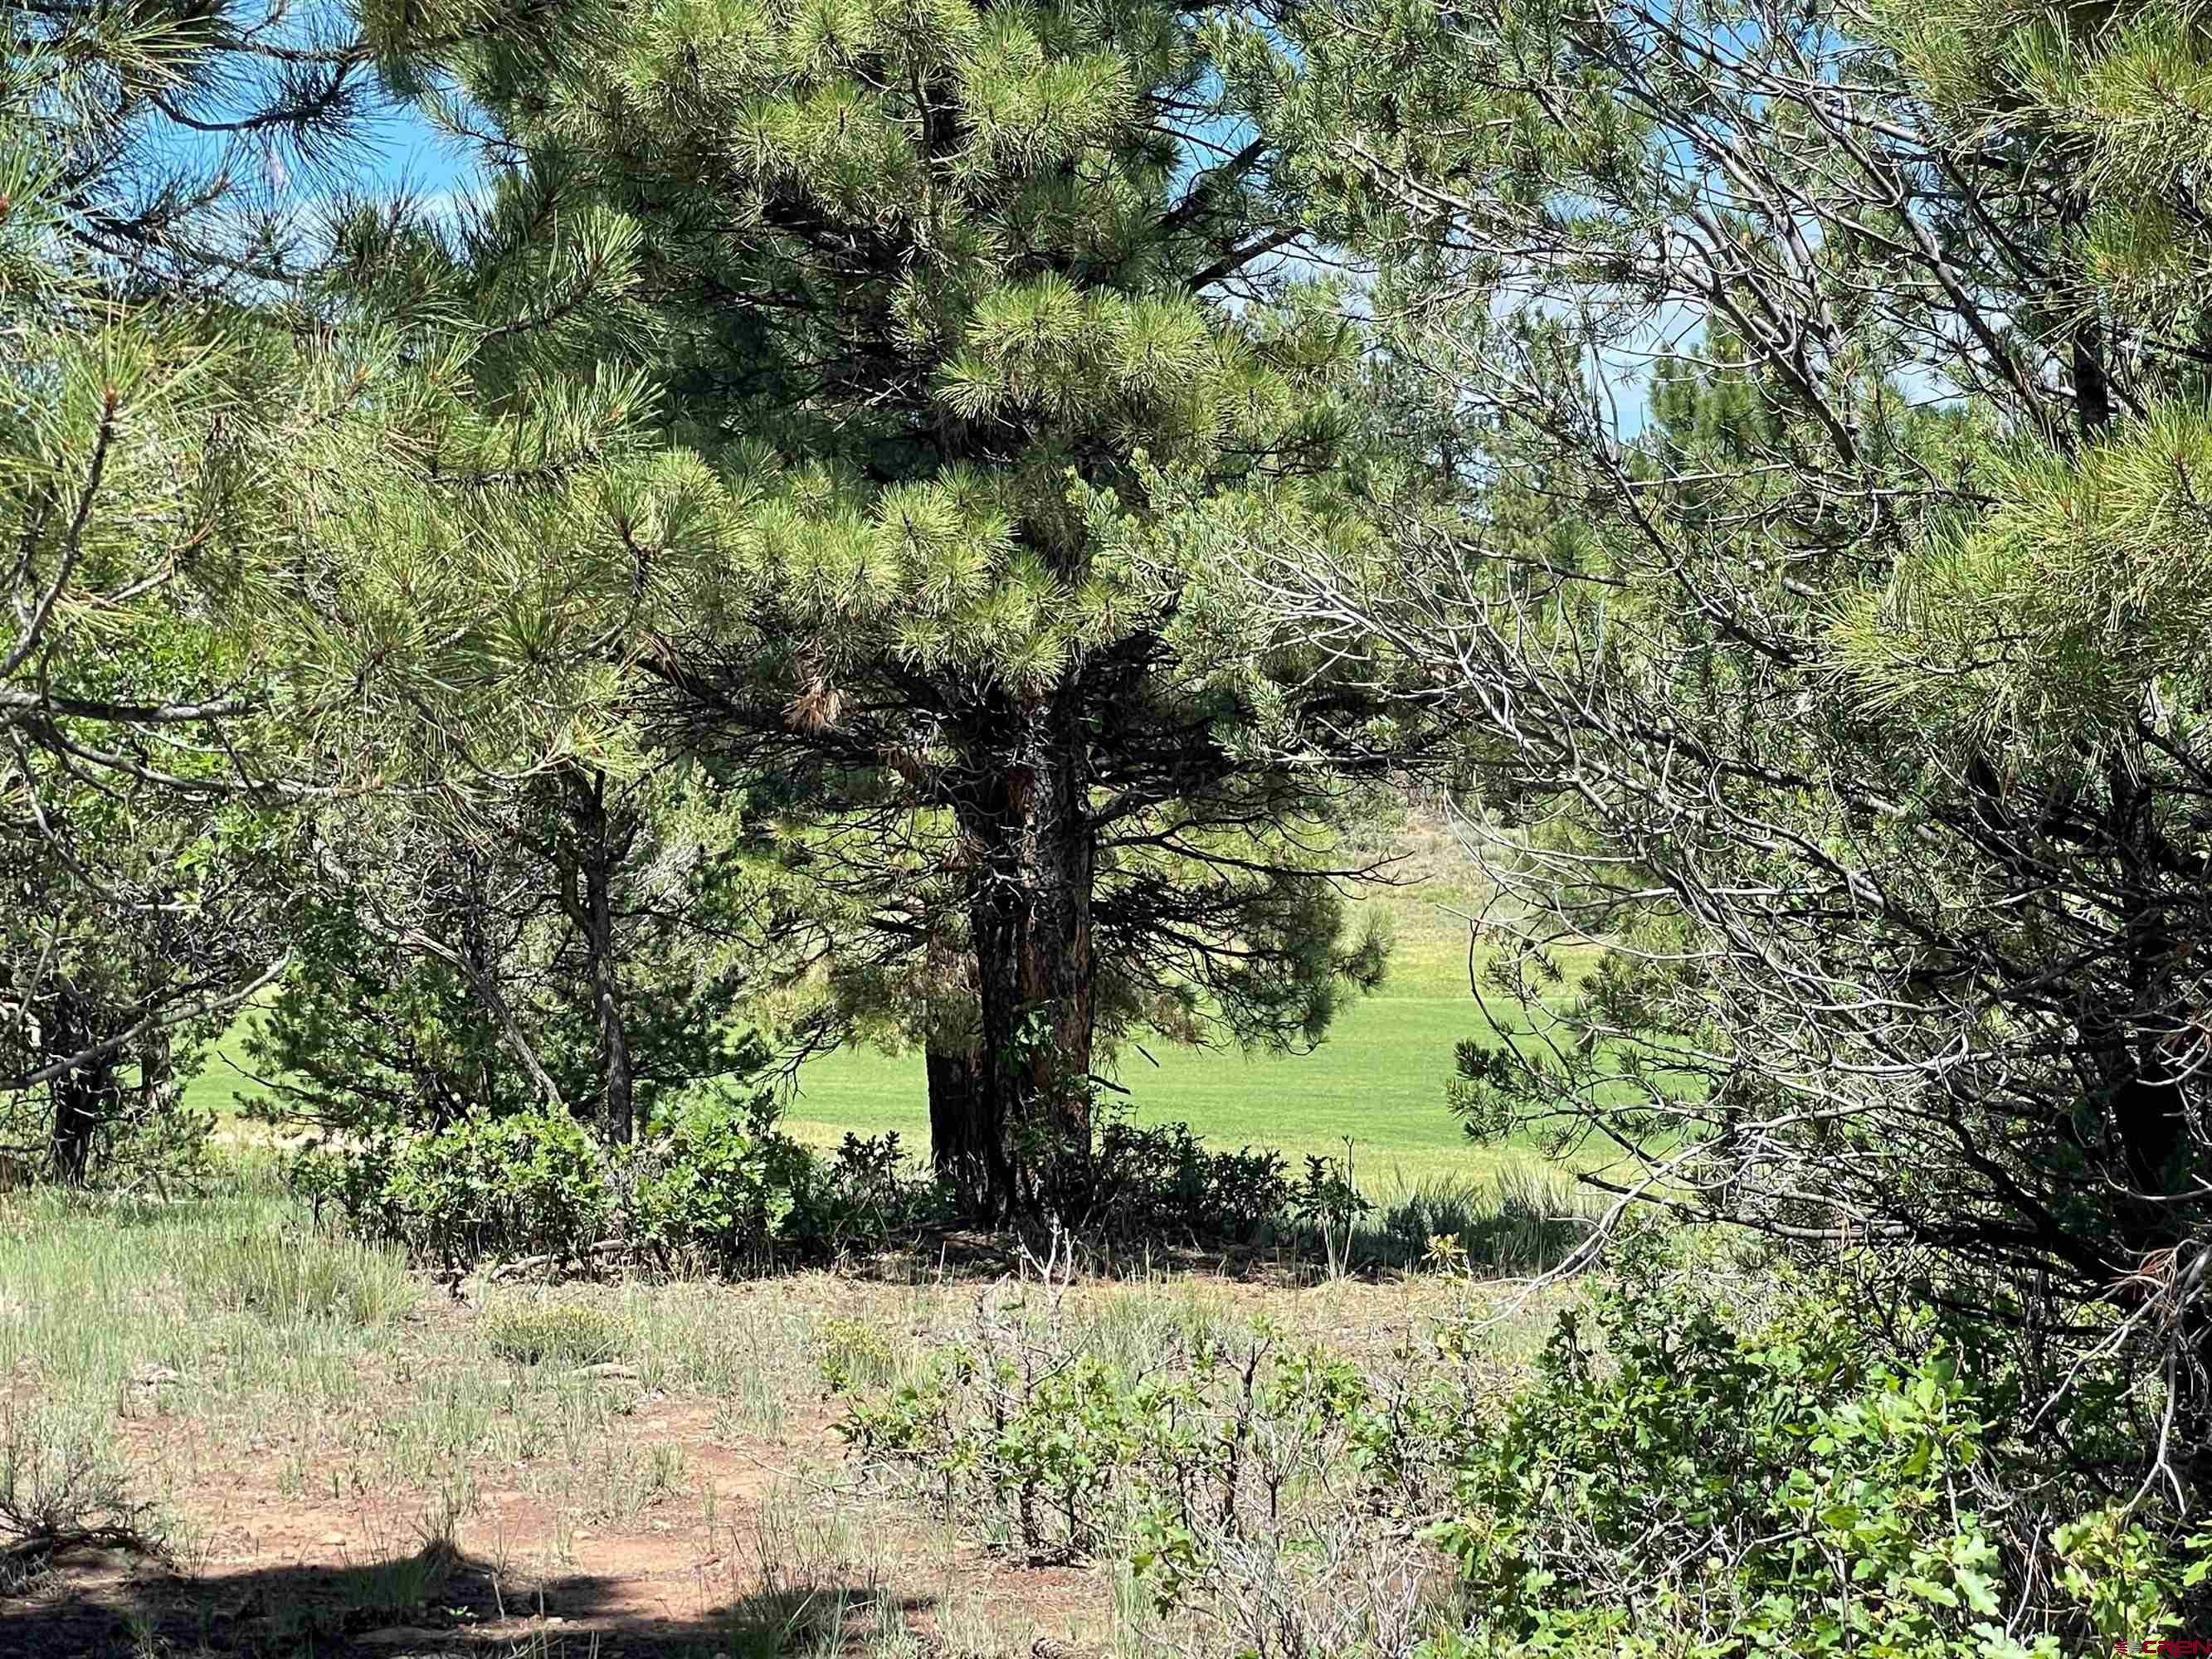 Tbd (lot 543) N Badger Trail Property Photo